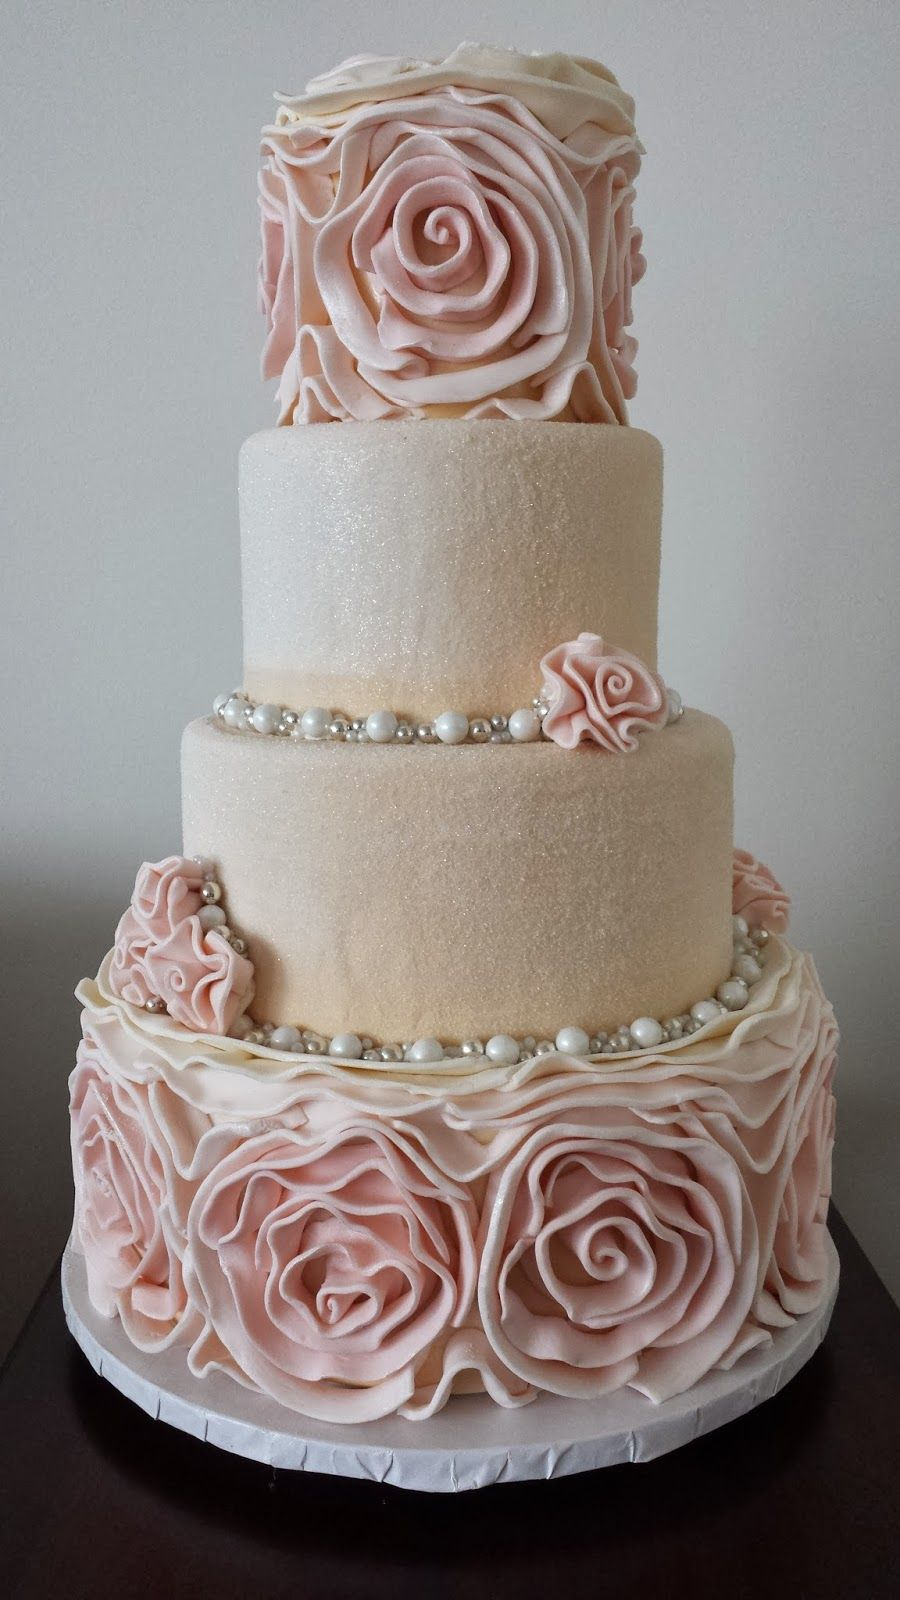 Tickled Pink Cakes Large Rosette Winter Wedding Cake